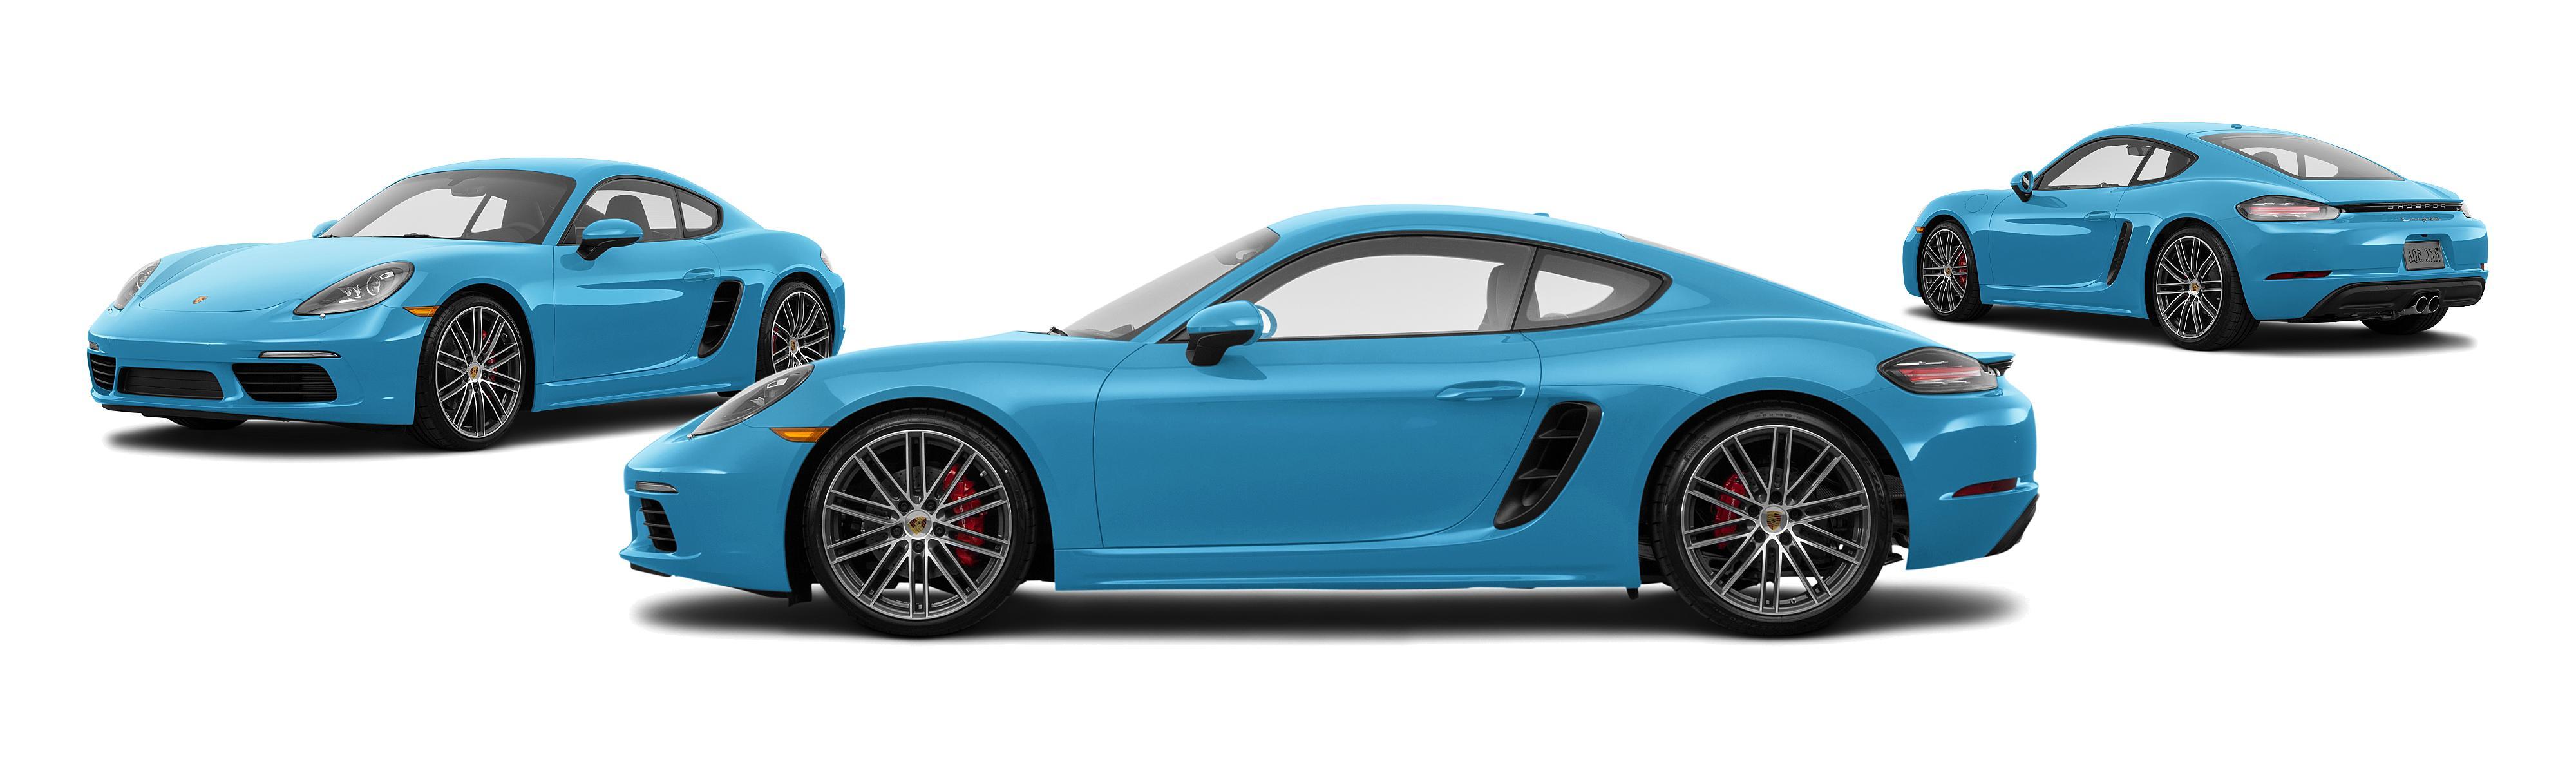 Porsche Cayman S Dr Coupe Research GrooveCar - Porsche cayman invoice price